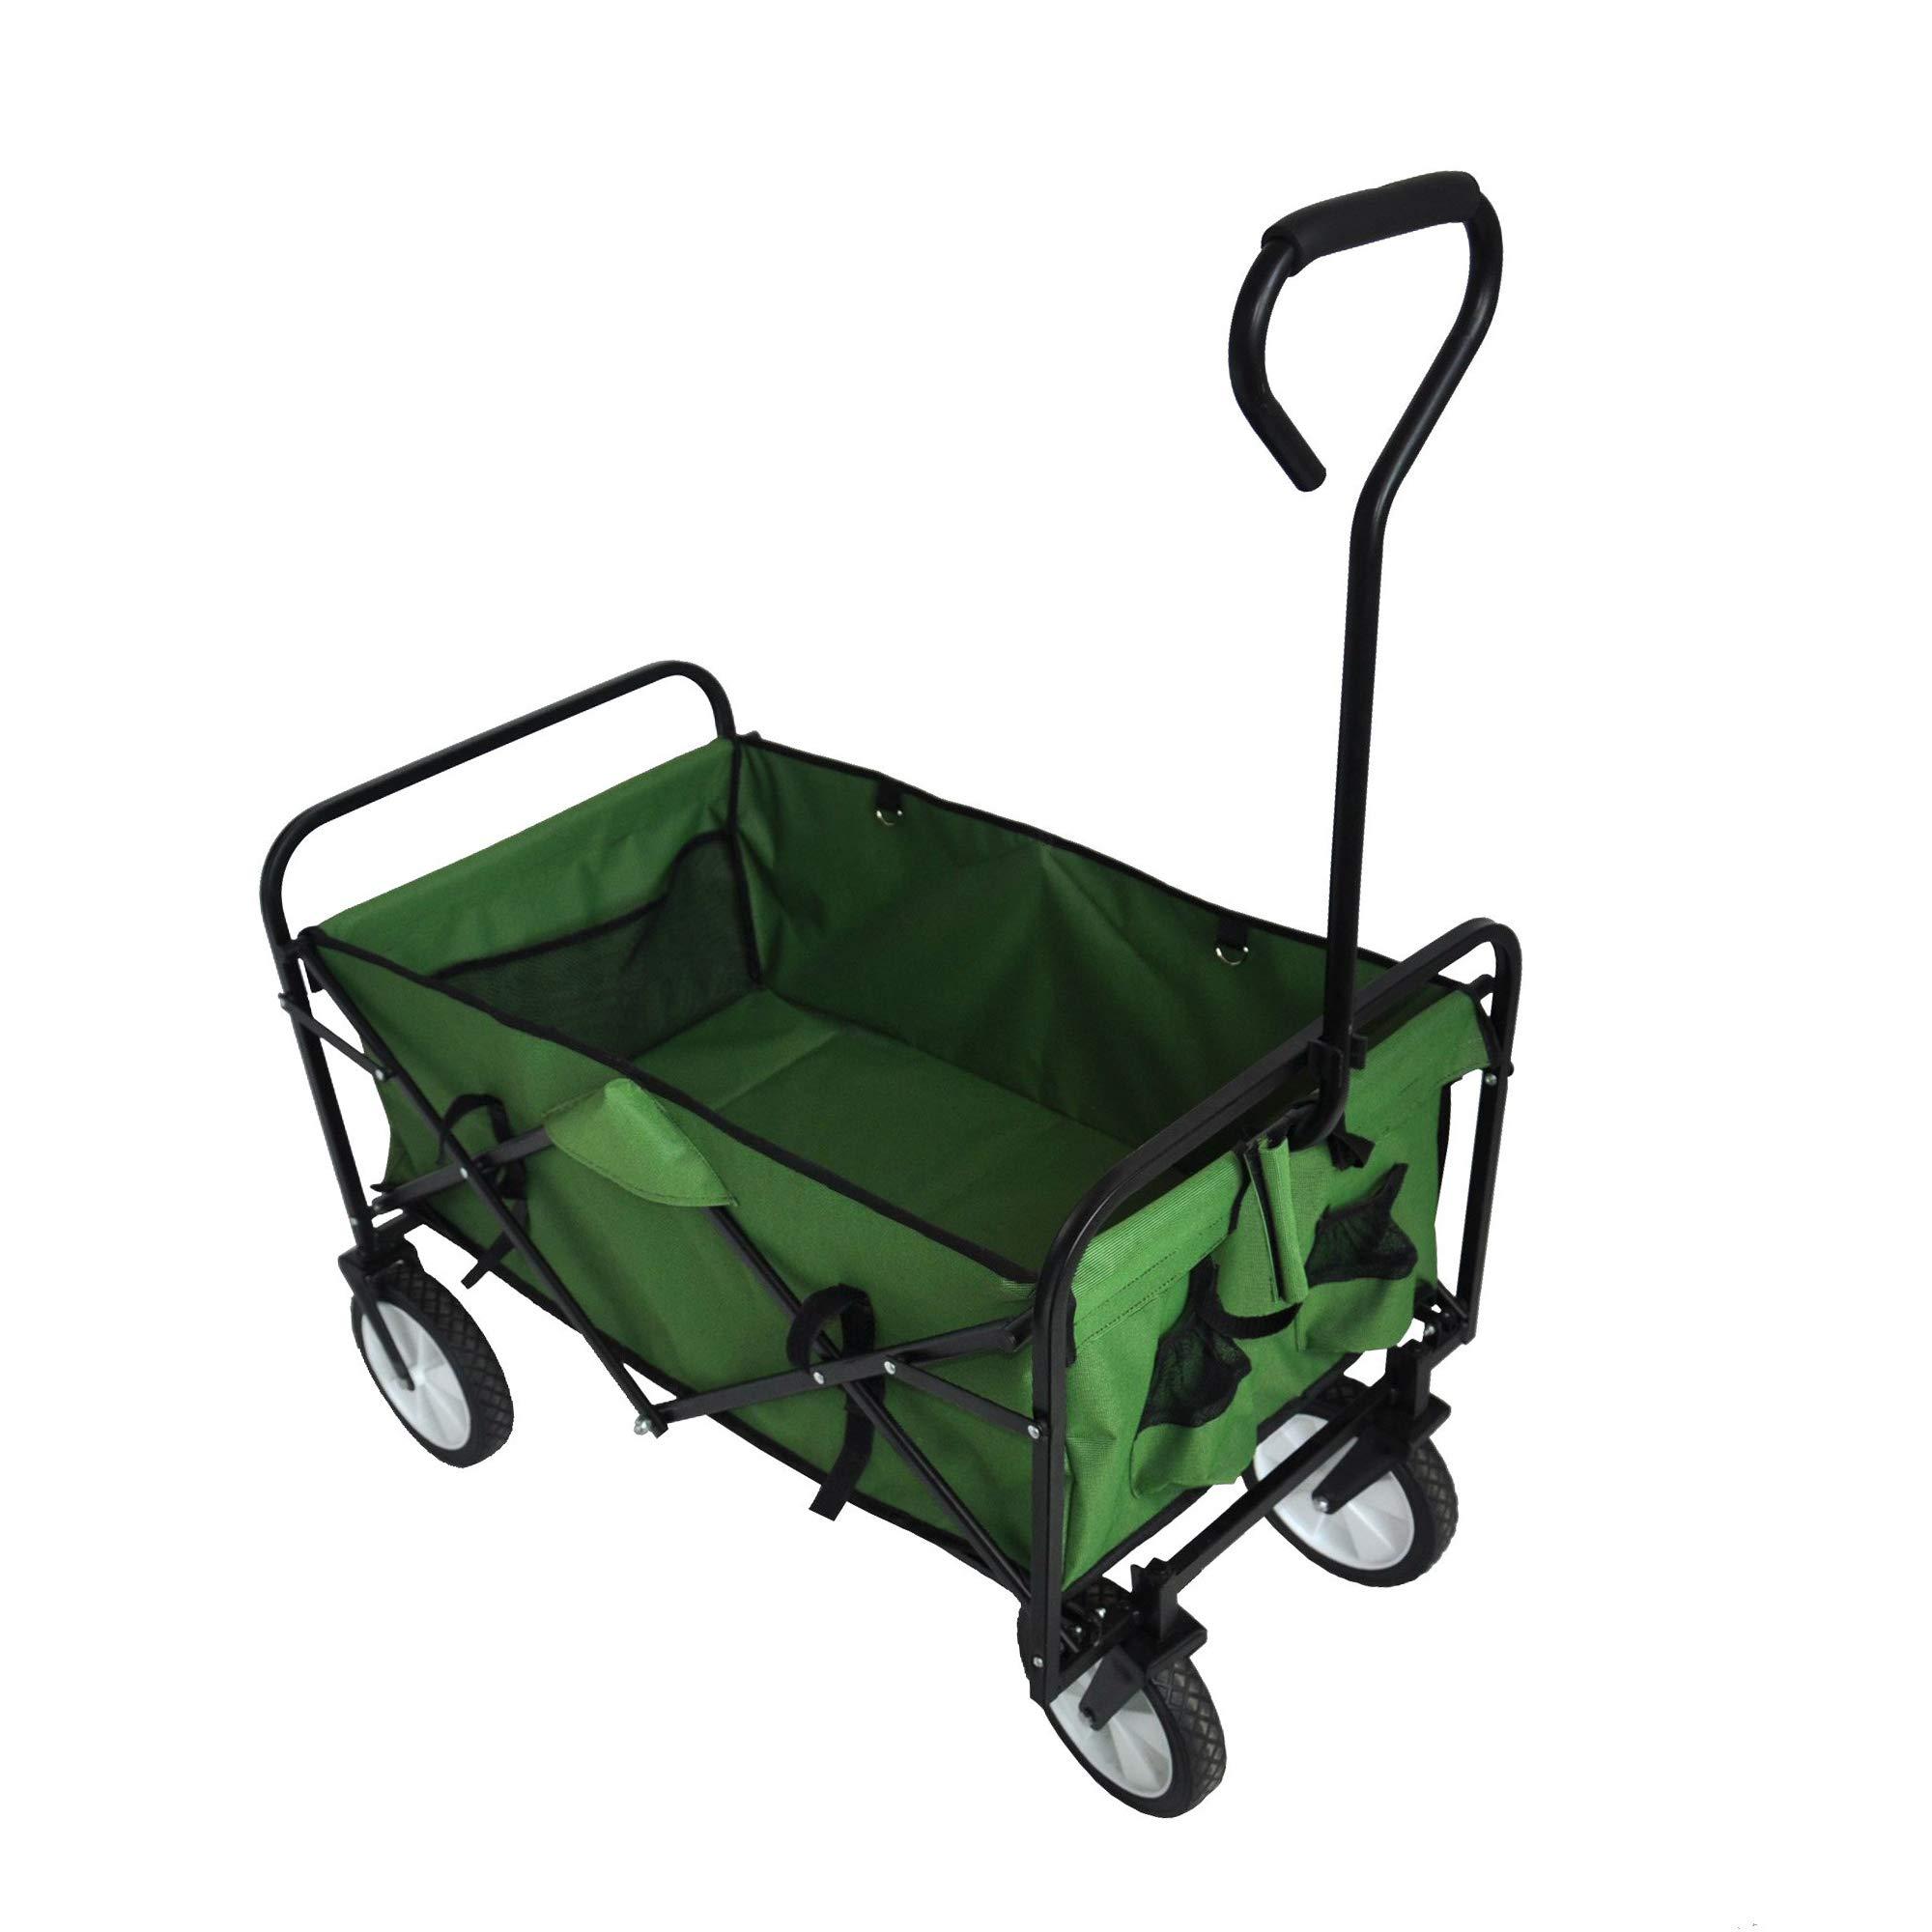 BHW Folding Wagon Garden Shopping Beach Cart Mac Sports Collapsible Folding Outdoor Utility Wagon by BHW